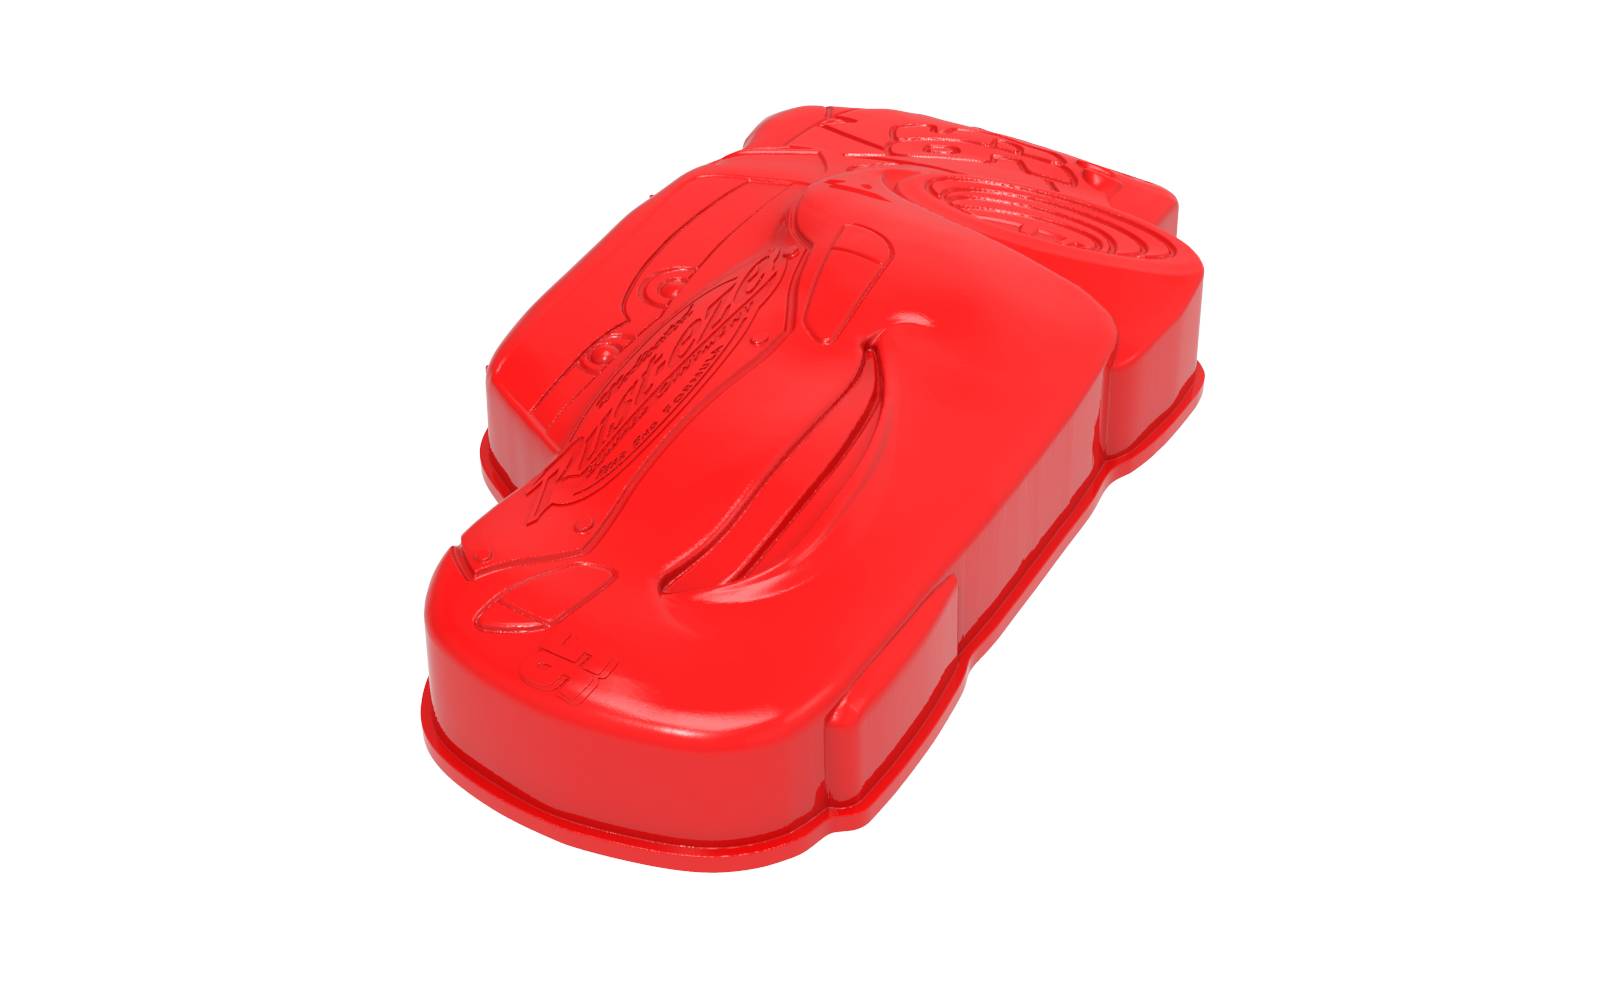 untitled.1664.png Download free STL file Pixar Cars - Mcqueen • 3D printable design, hcchong